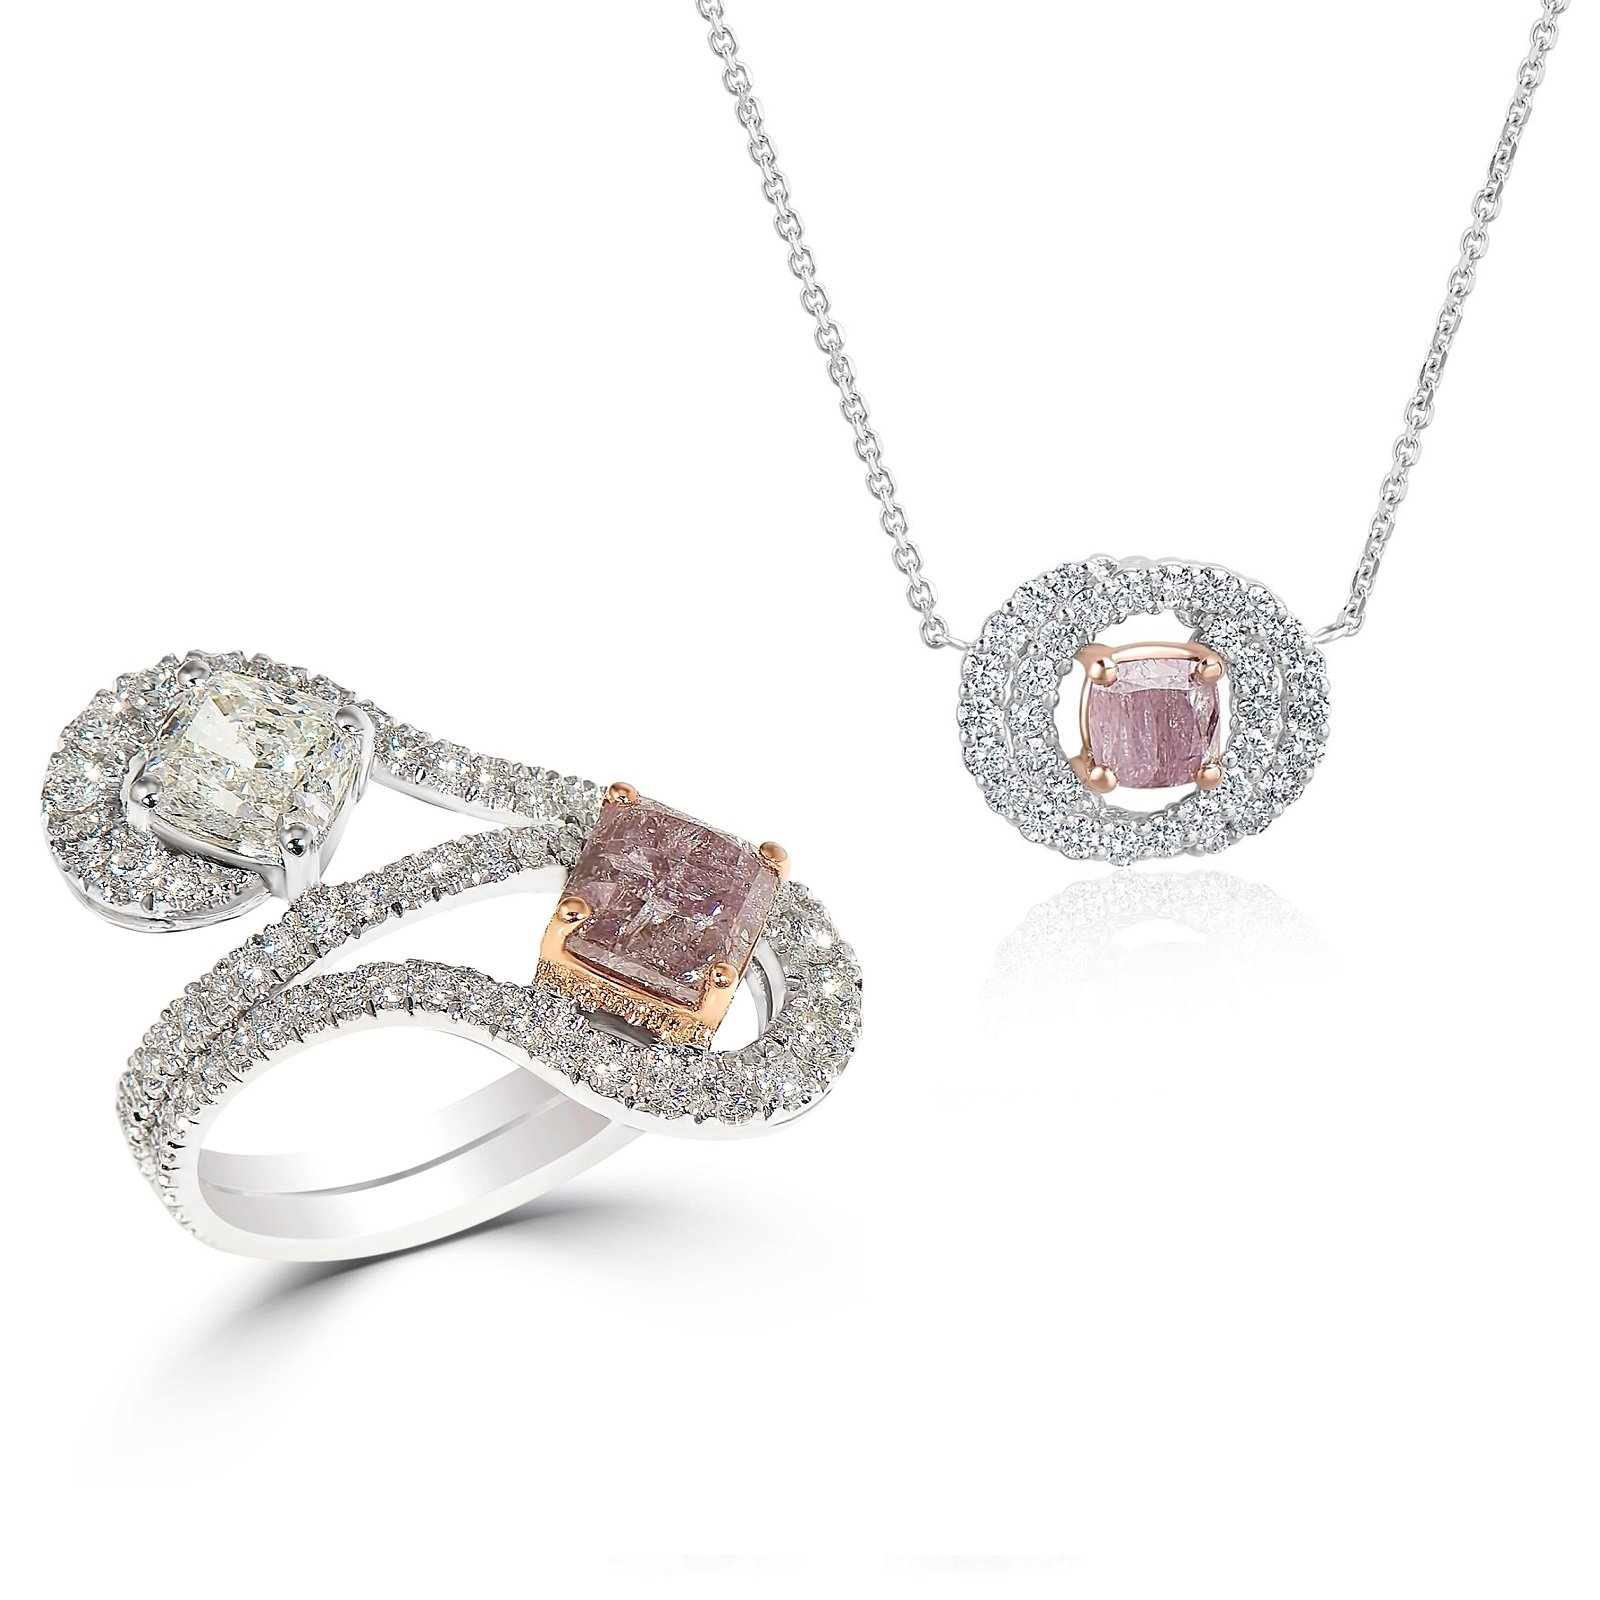 Mixed Brownish Purplish Pink Diamond Ring & Pendant Set (6.50ct TW)